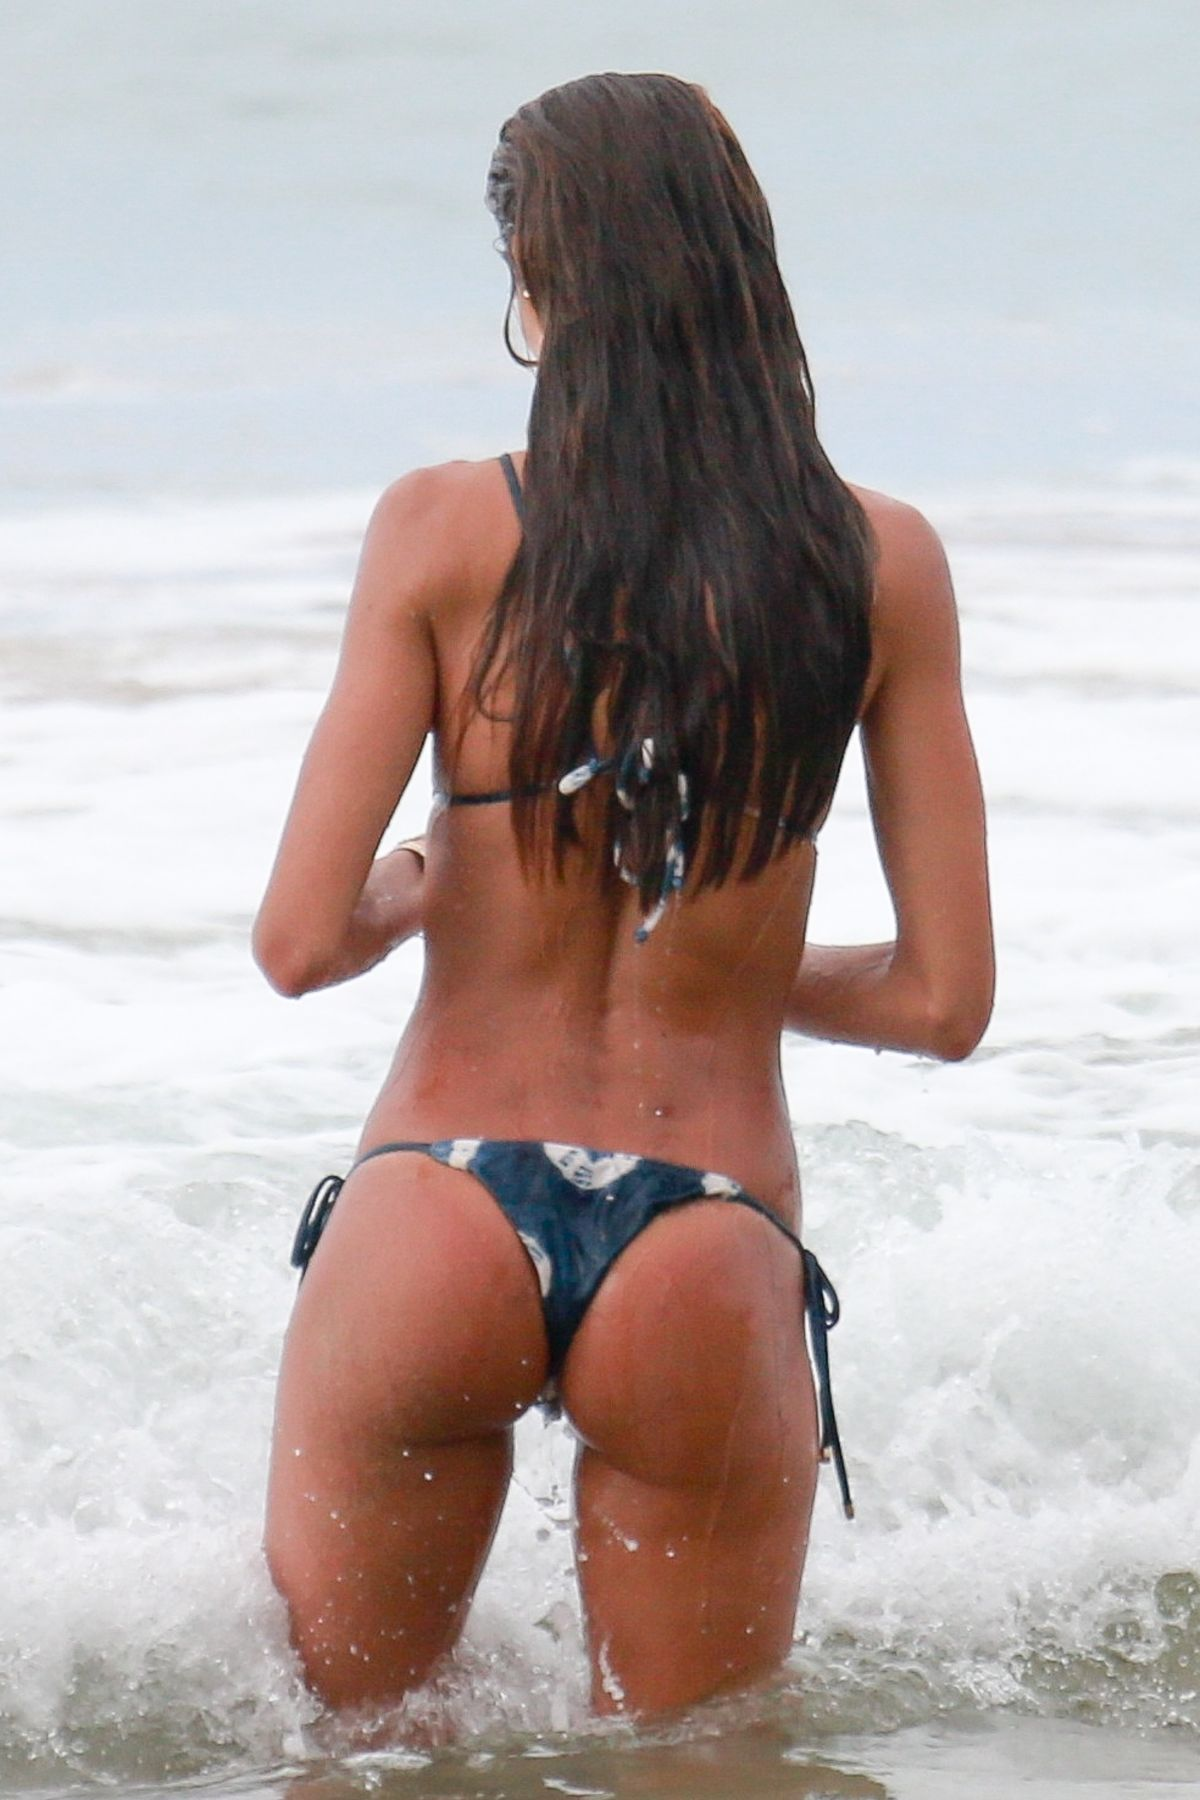 Izabel Goulart in Bikini and Kevin Trapp on the beach in Fernando de Noronha Pic 4 of 35